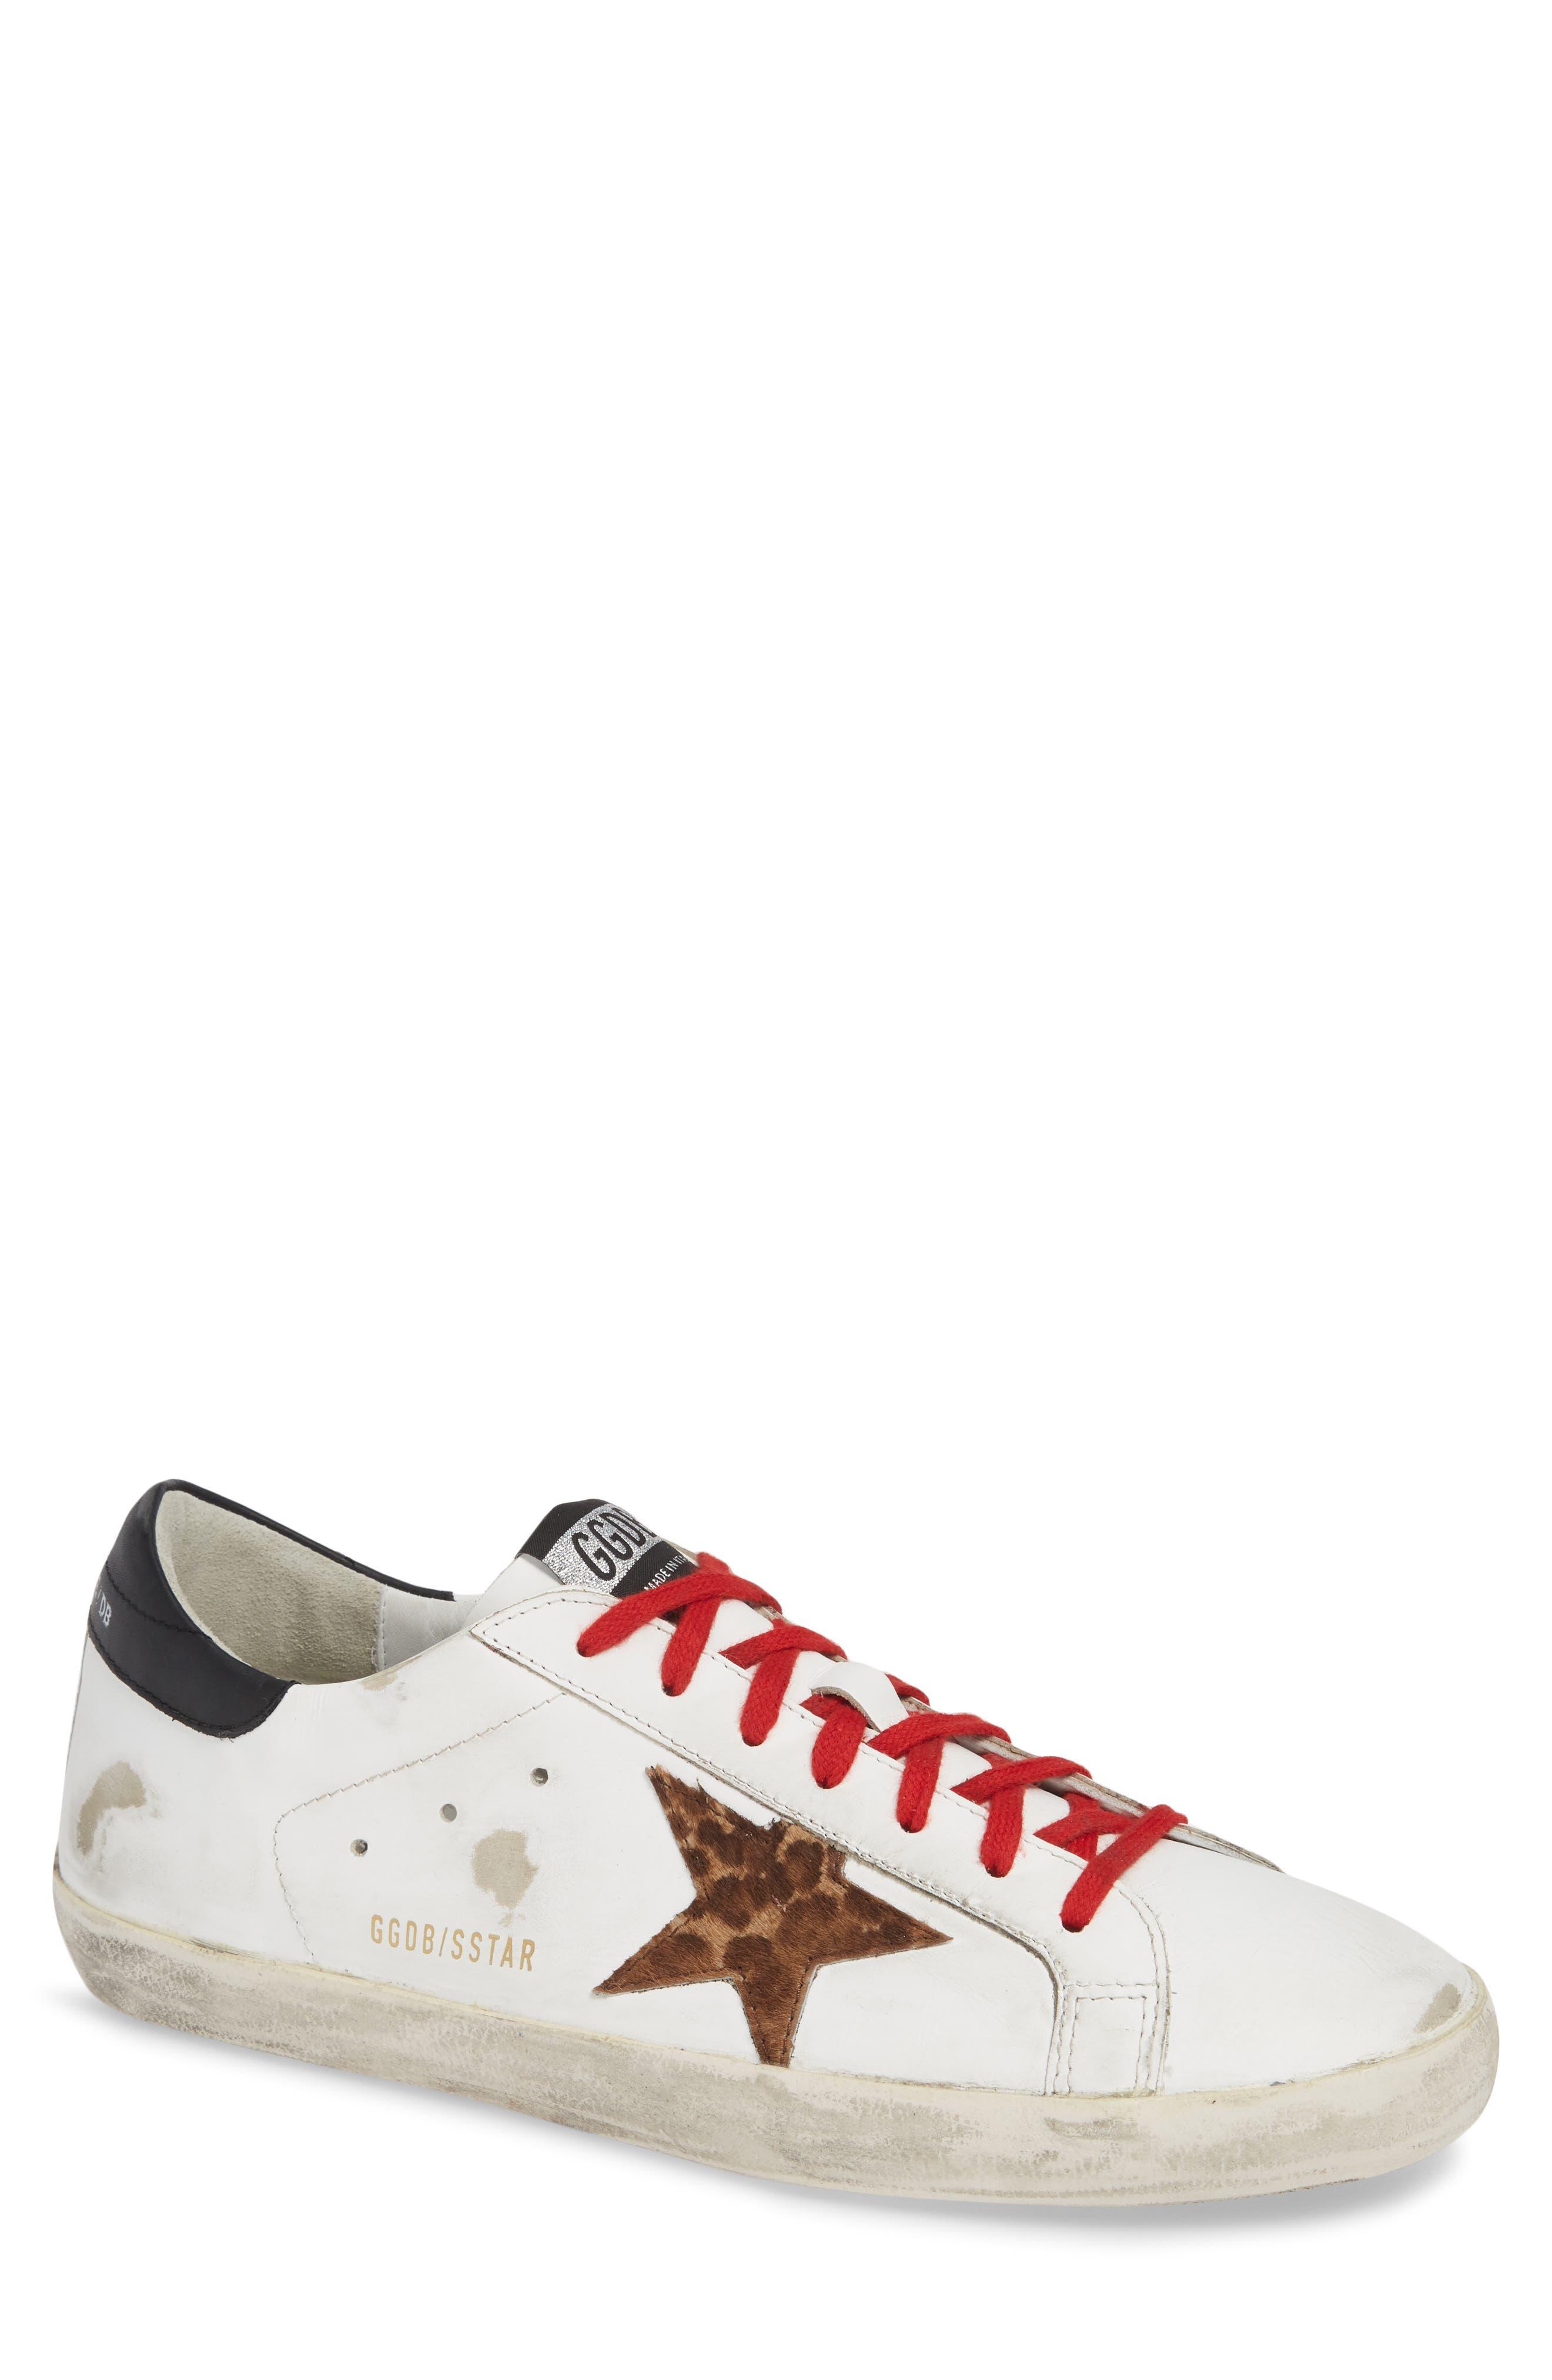 'Superstar' Sneaker, Main, color, 134